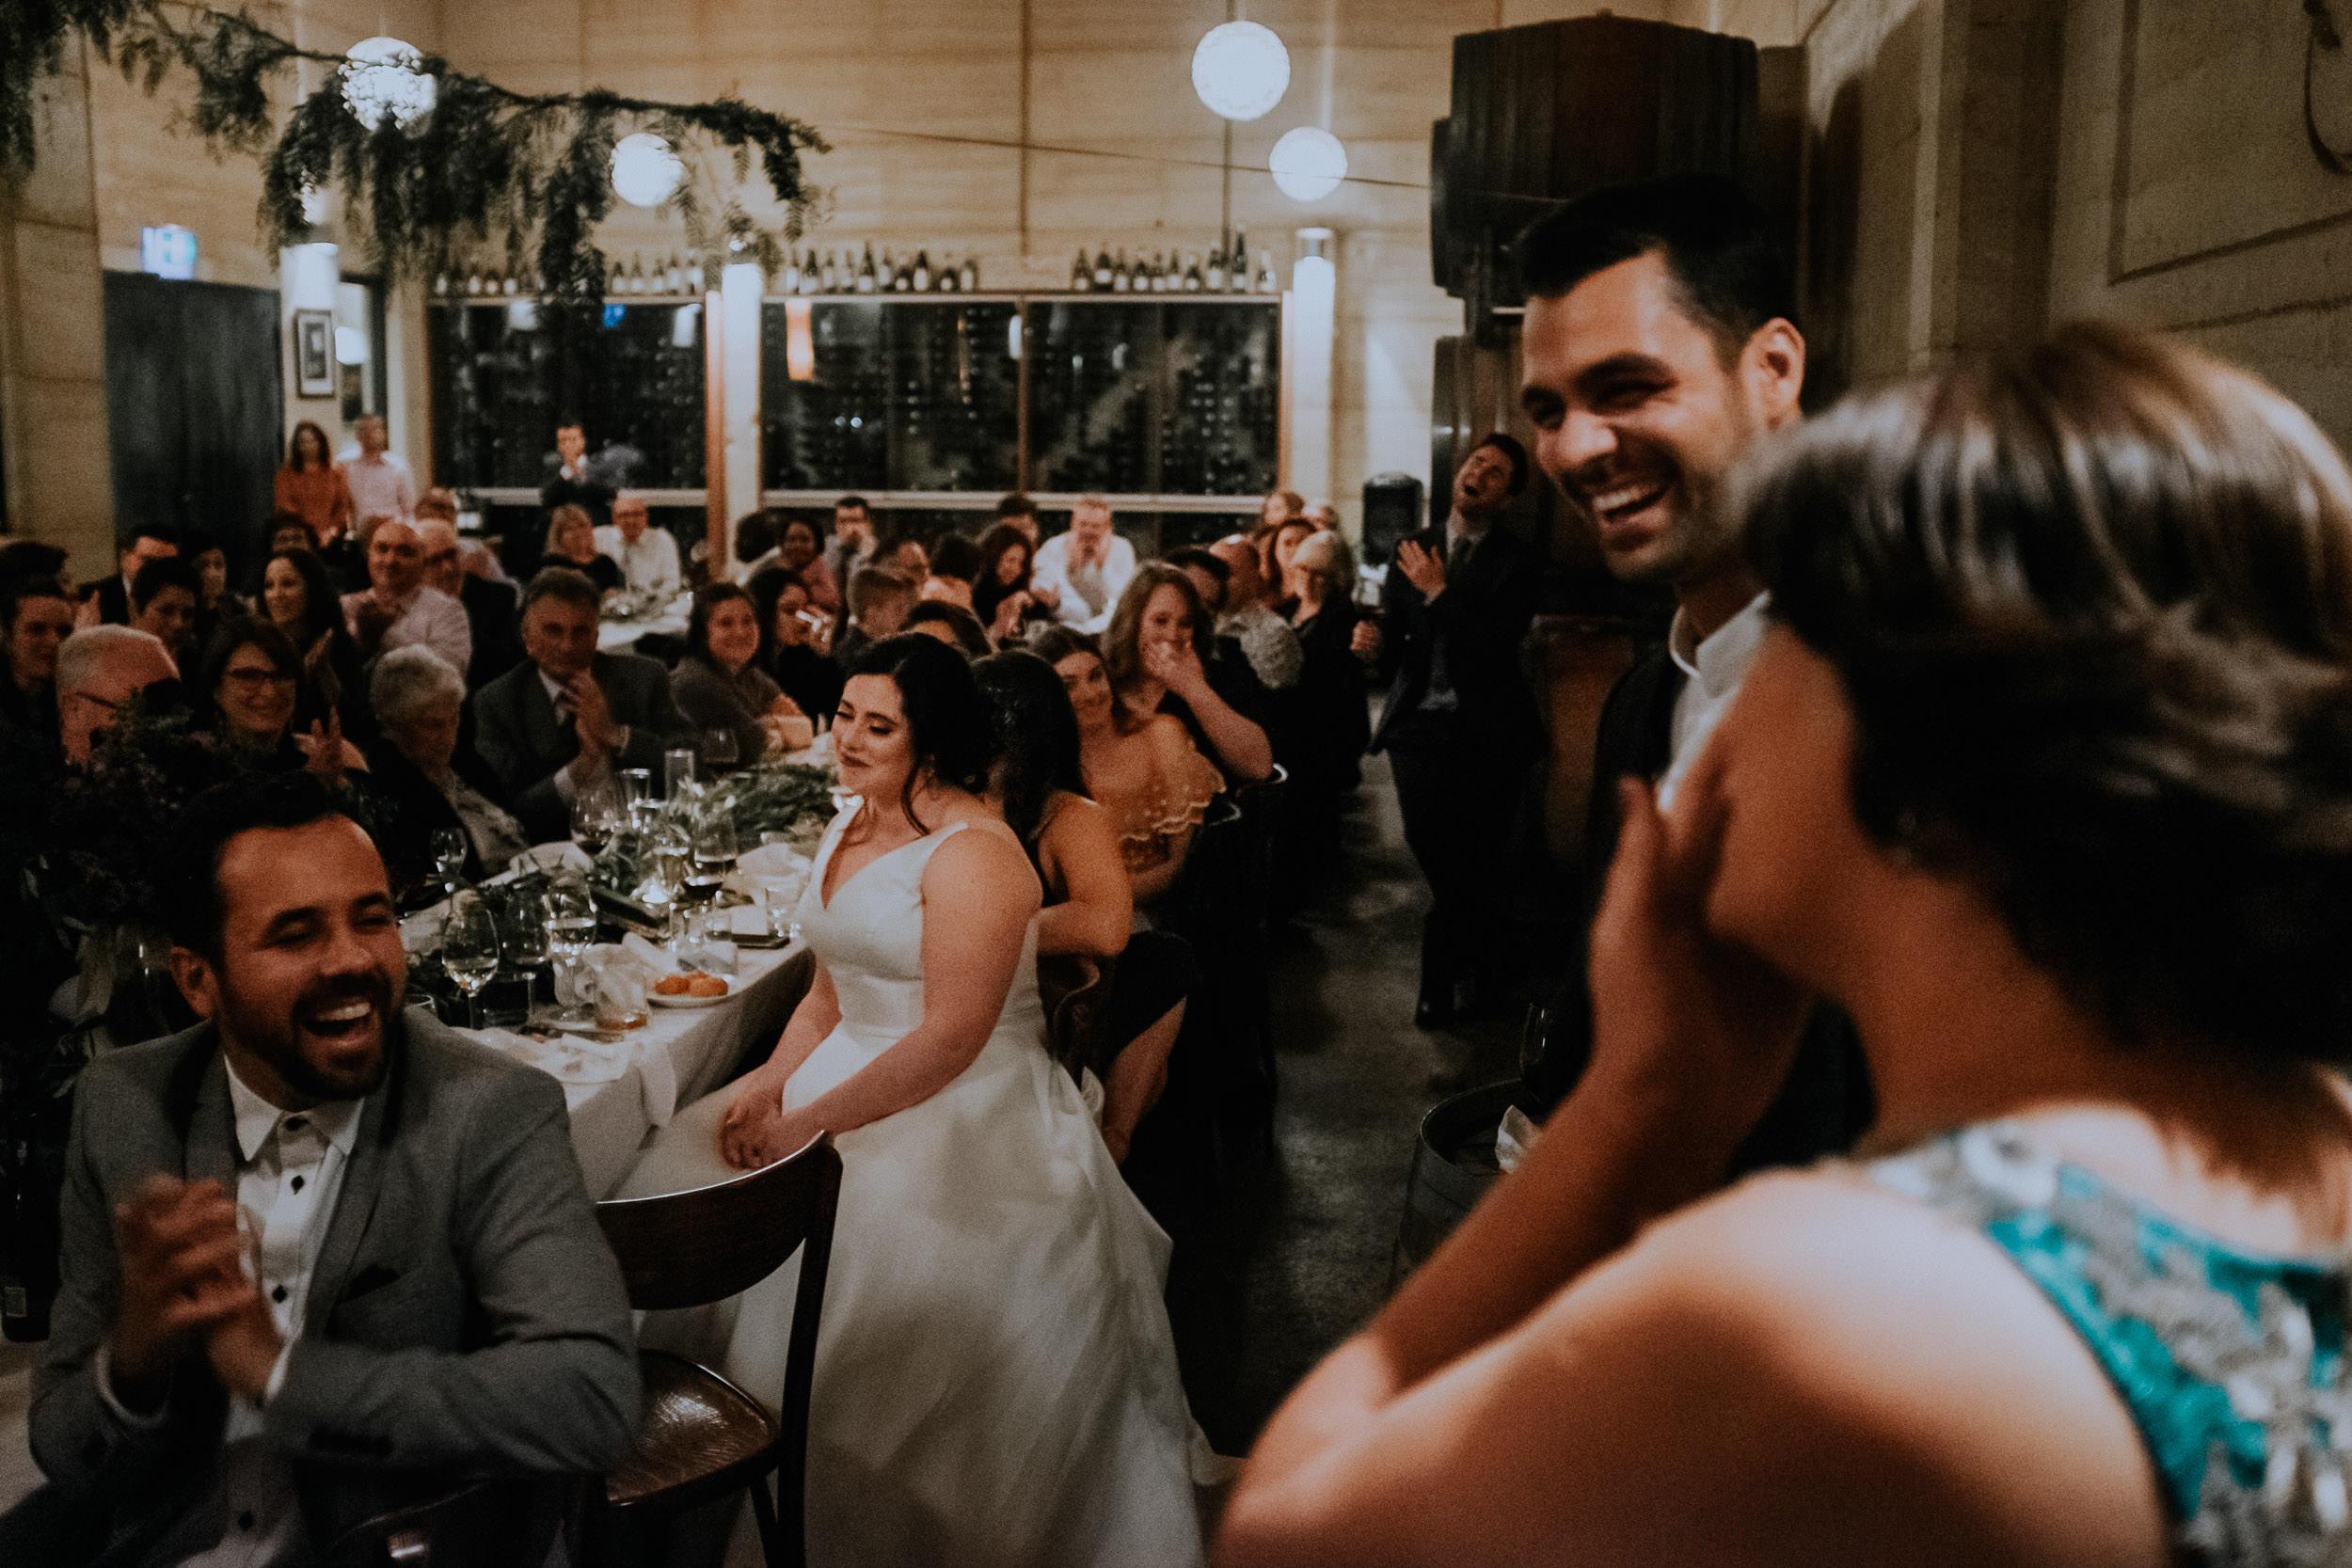 s+j_top_elopement wedding photography_kings & thieves_blog - 530.jpg